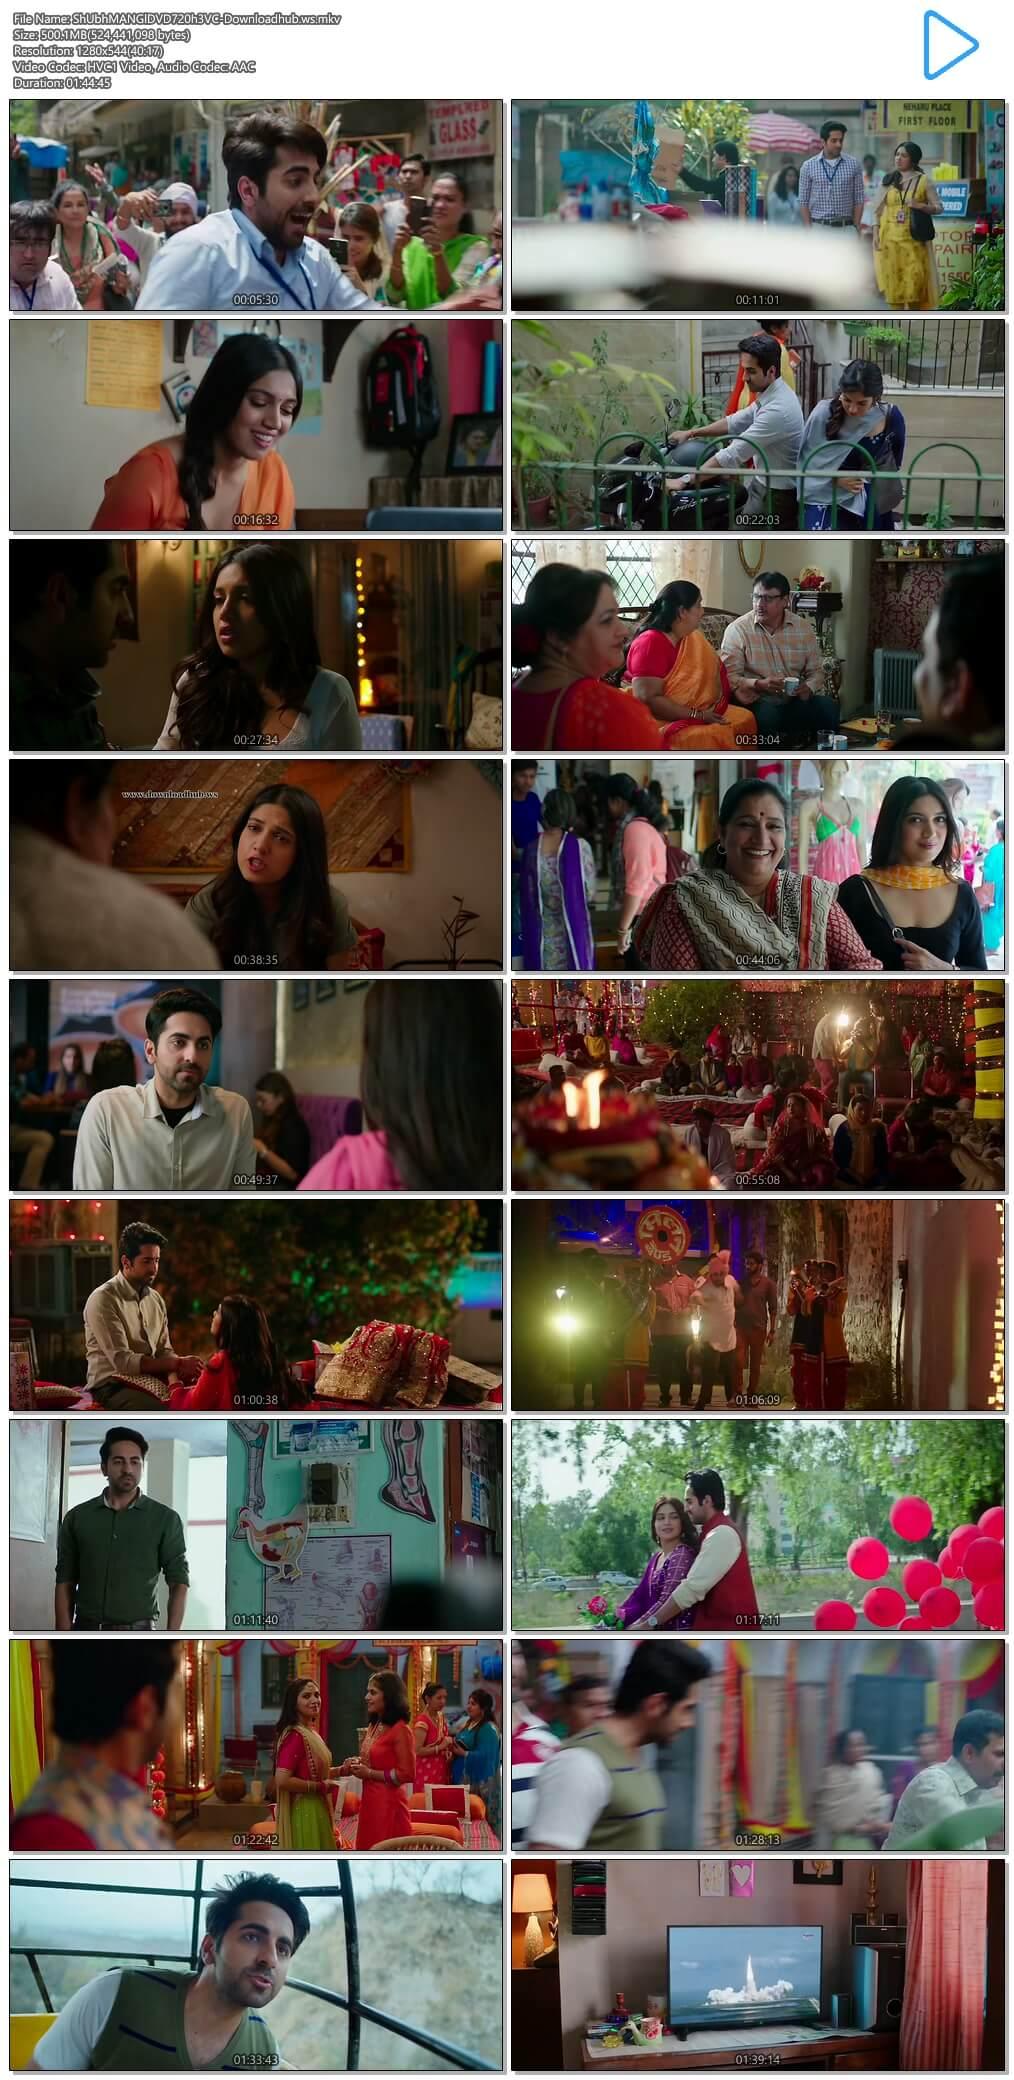 Shubh Mangal Saavdhan 2017 Hindi 720p HEVC DVDRip ESubs